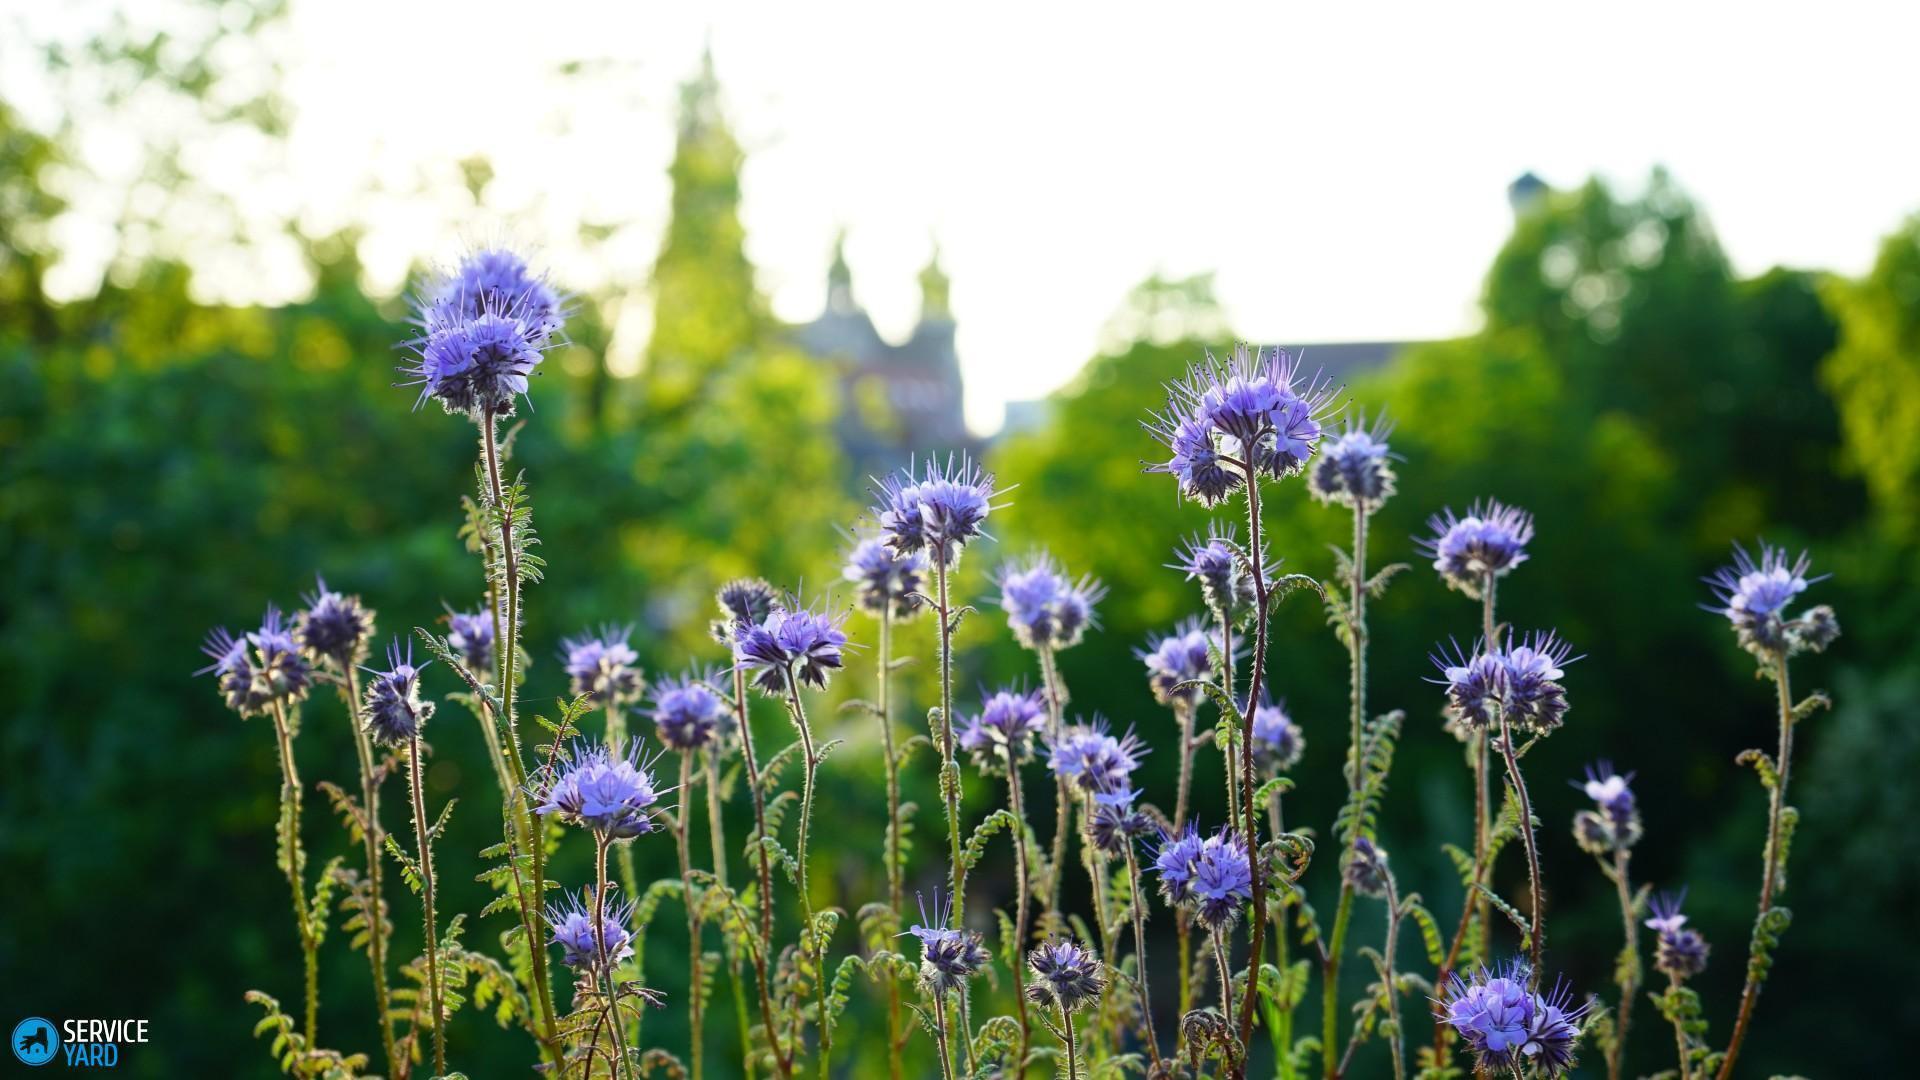 phacelia-blue-flowers-garden-sunlight-wallpaper-1920x1080